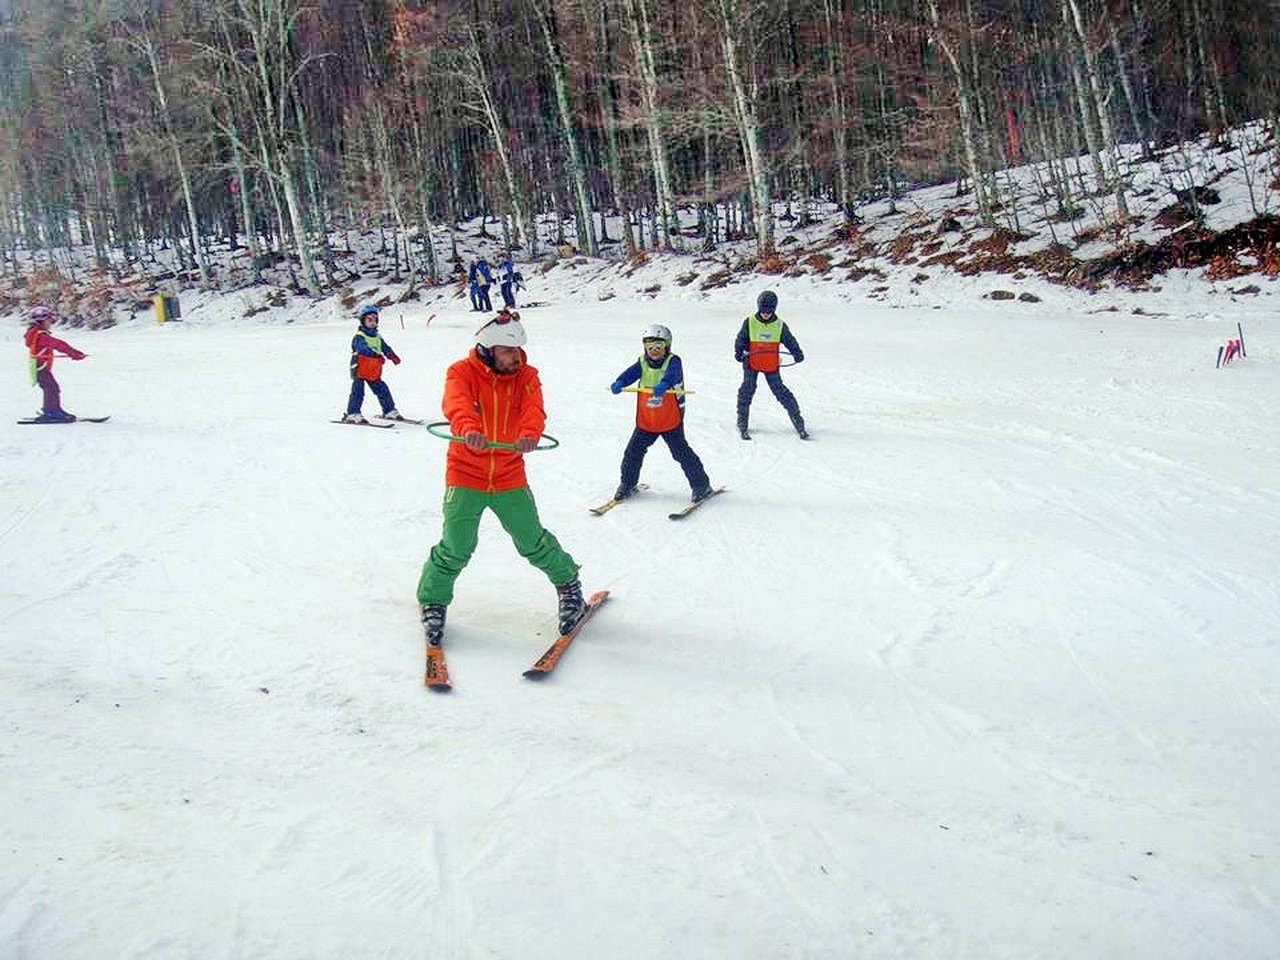 skiteam.gr-ski-academy-thessaloniki-2nd-weekend-18-19-january-2015-3-5-pigadiai-02